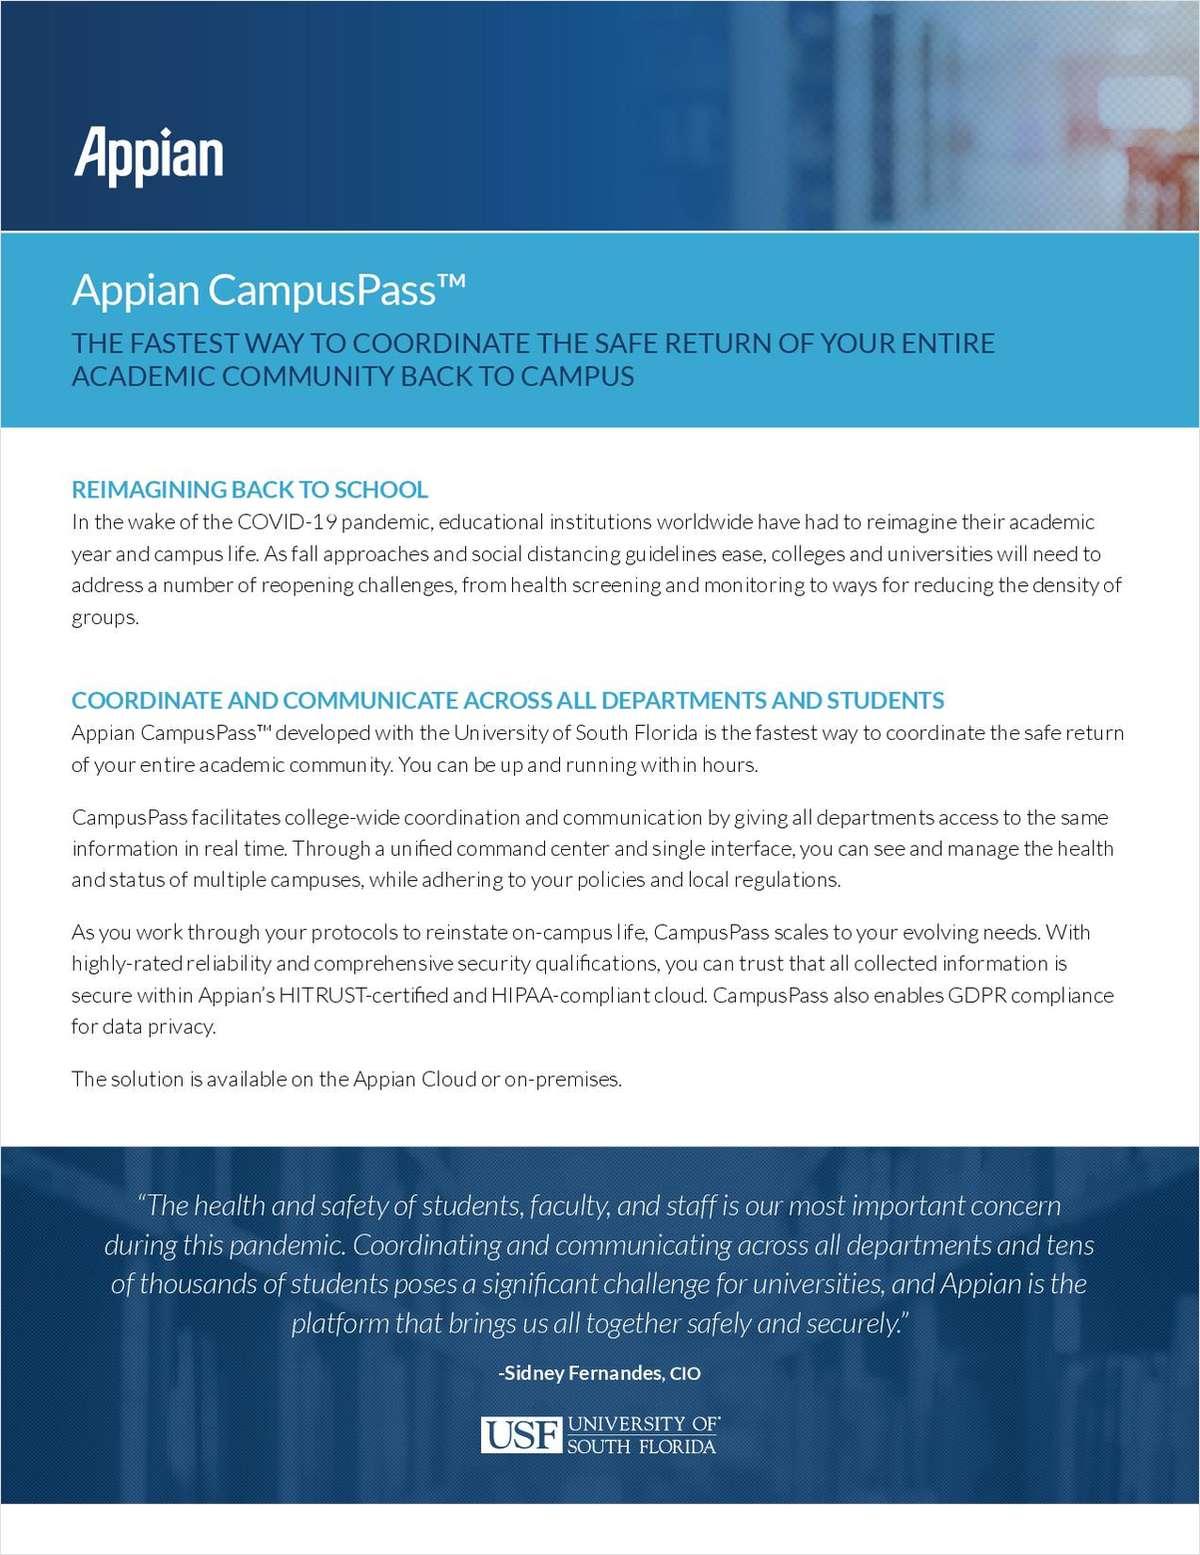 Appian CampusPass™